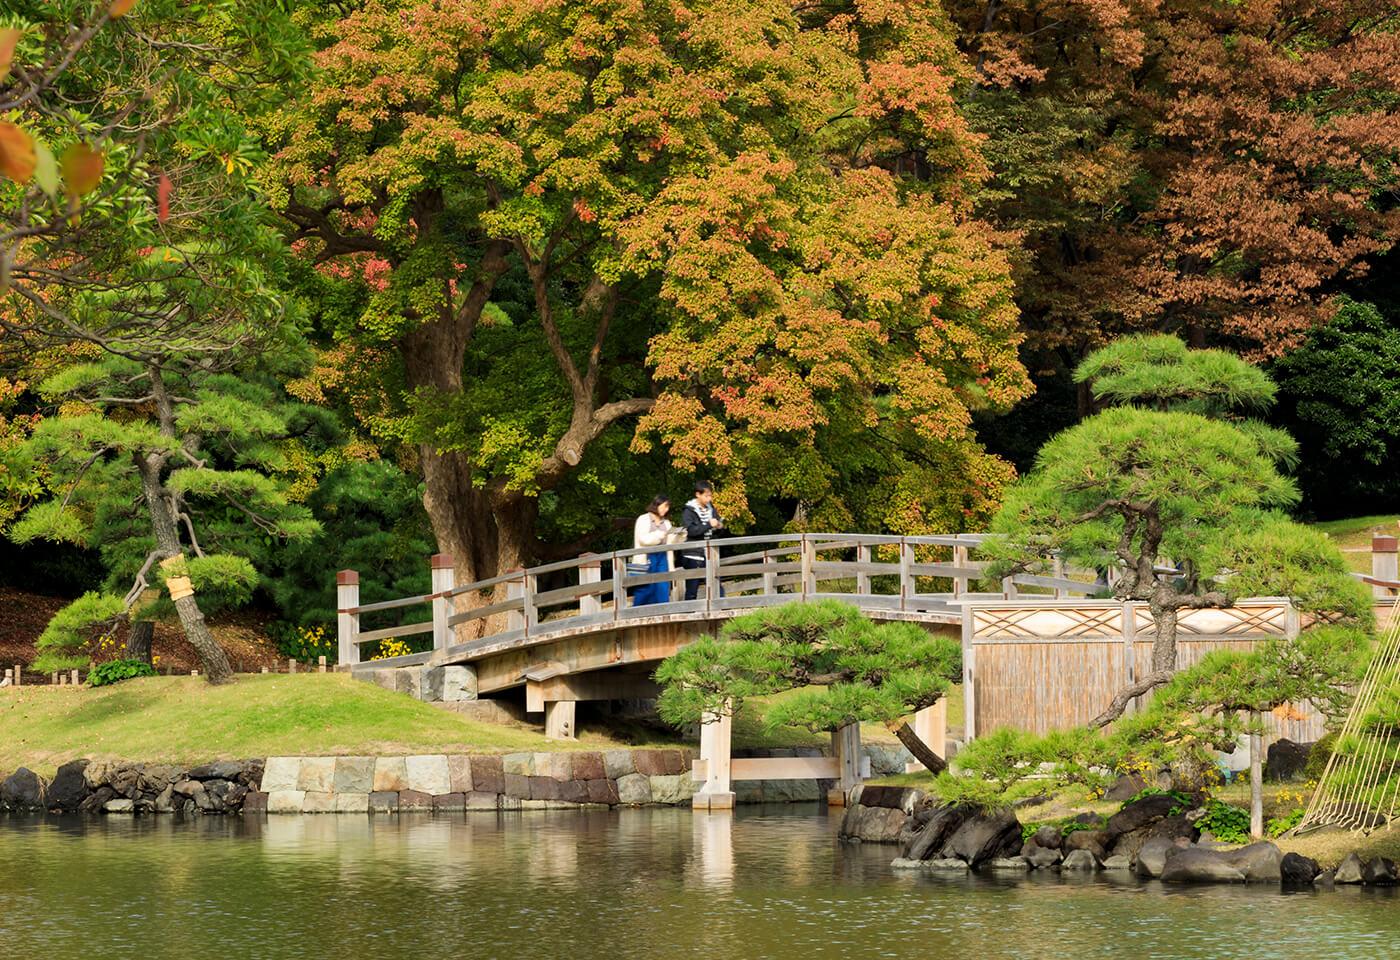 Photo Walk at Shoyoen Japanese Garden Dubbo